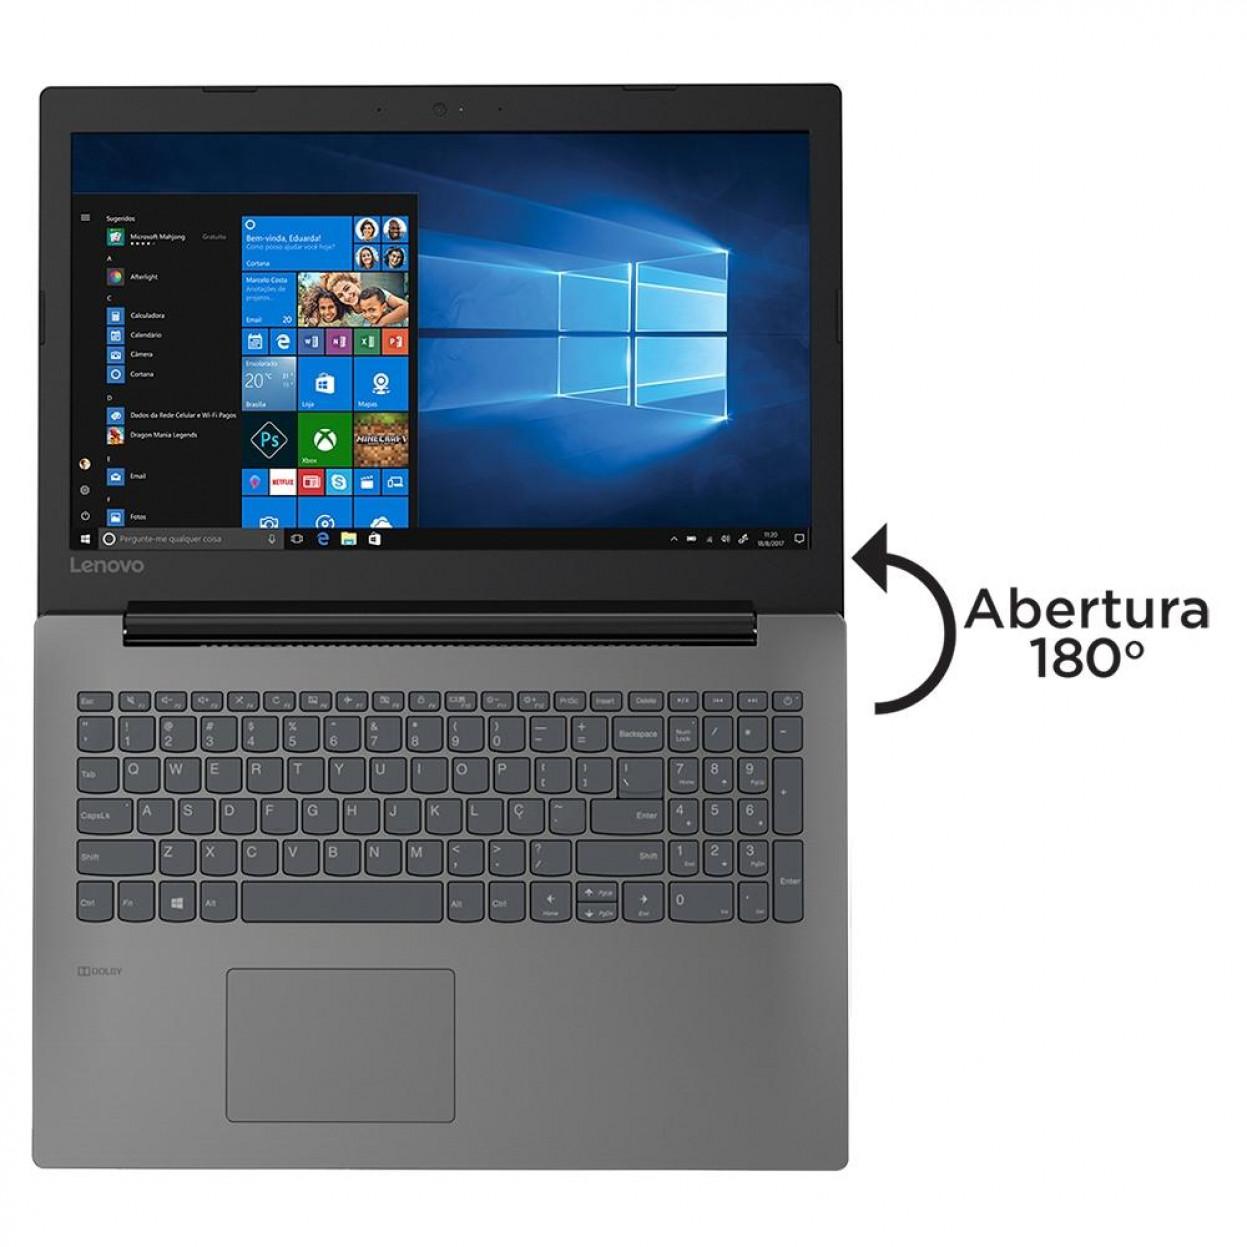 Notebook Lenovo B330 Core I3 7020u Memoria 8gb Ssd 480gb Tela 15.6' Hd Windows 10 Home